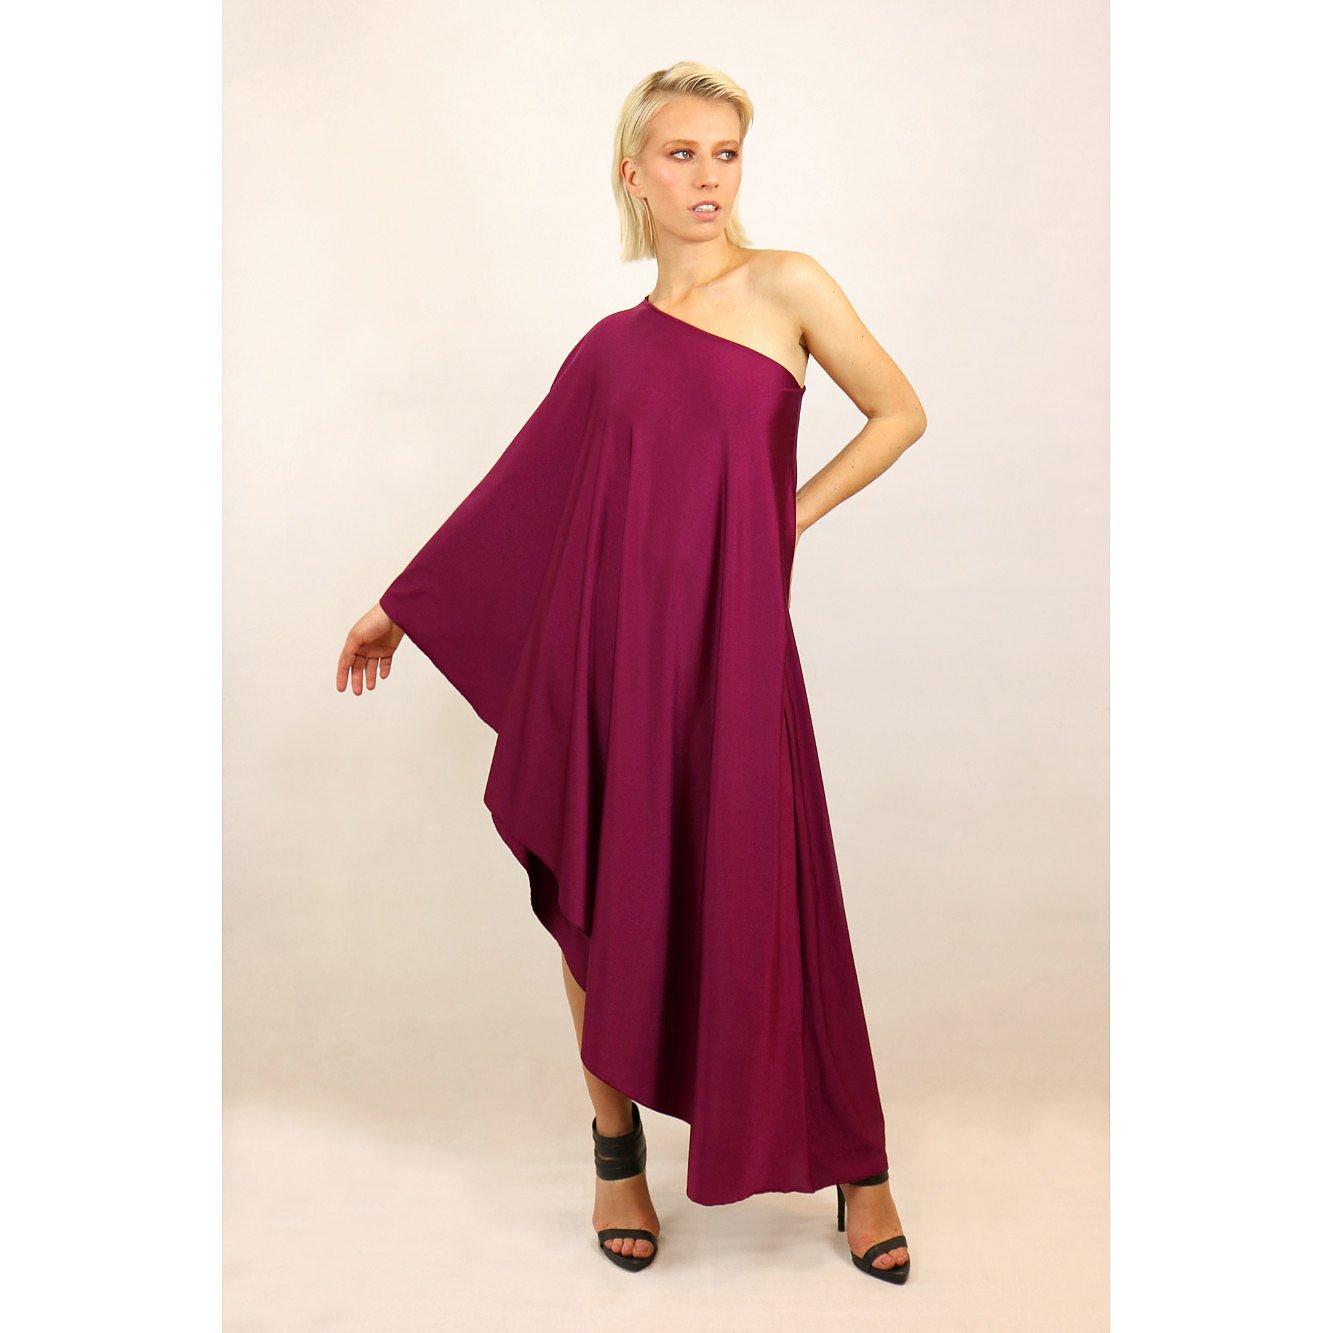 Riona Treacy Disco Dress